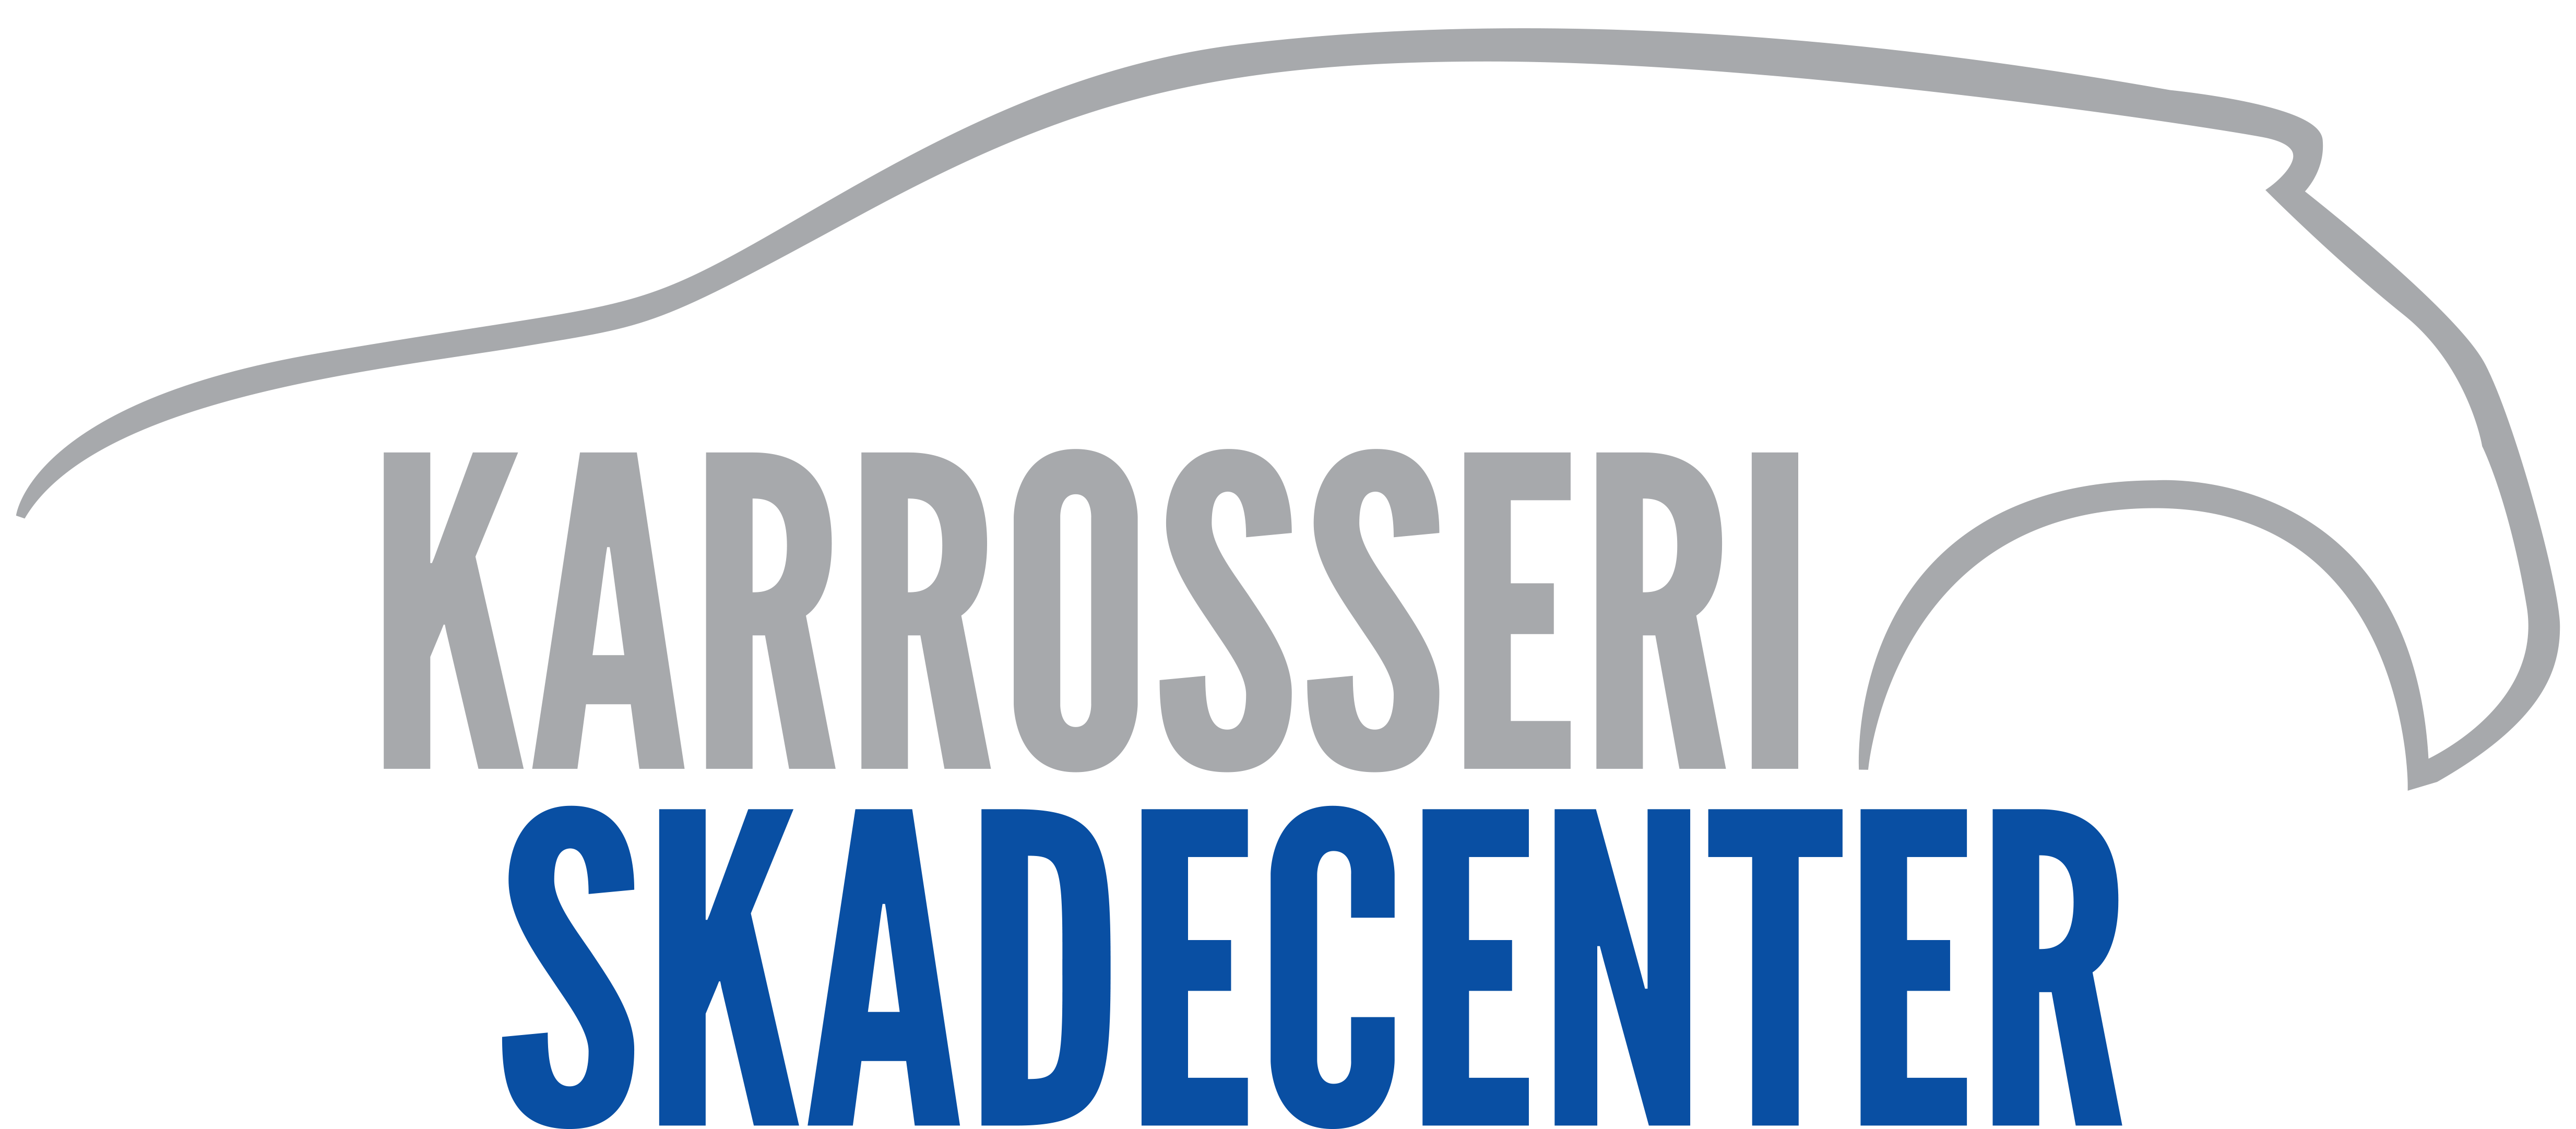 Karrosseri &Skadecenter _logo